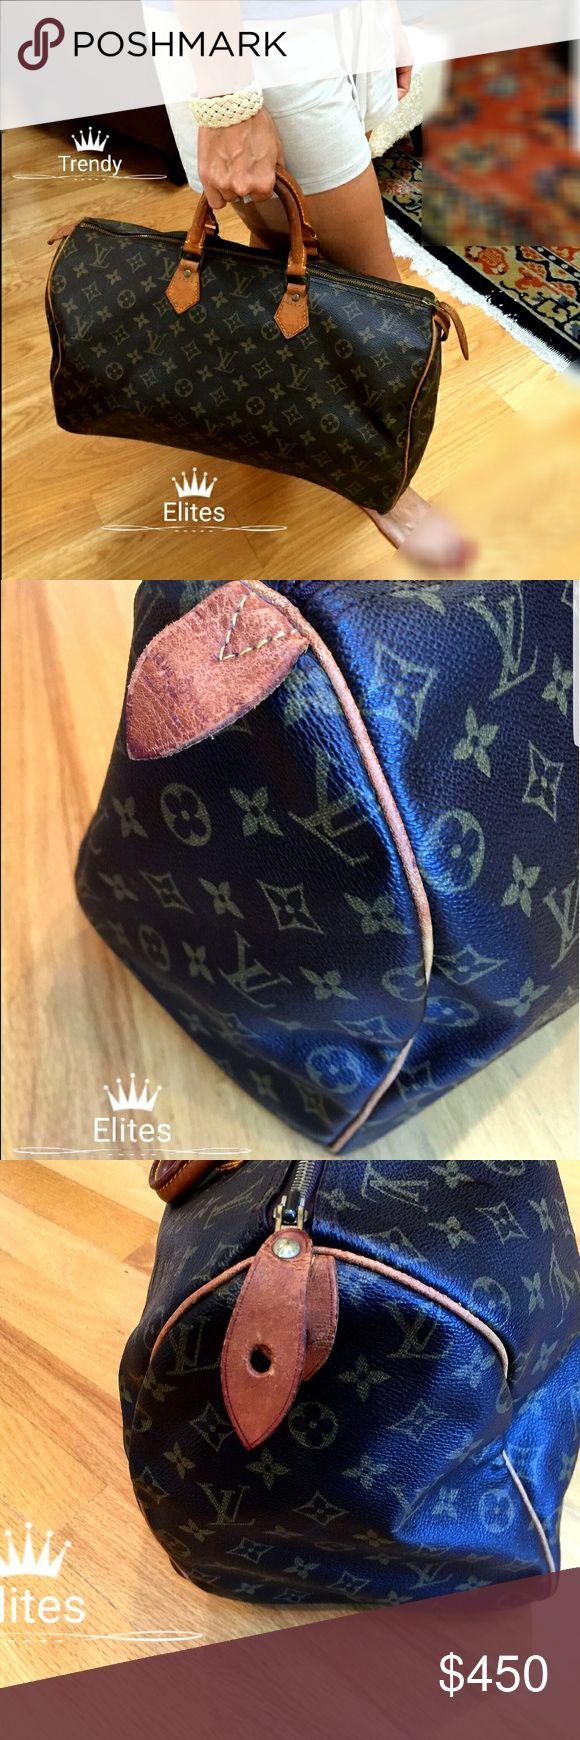 Authentic Louis Vuitton Speedy 40 Monogram Style Louis Vuitton Speedy 40 B Condition 100% Authentic Louis Vuitton Bags